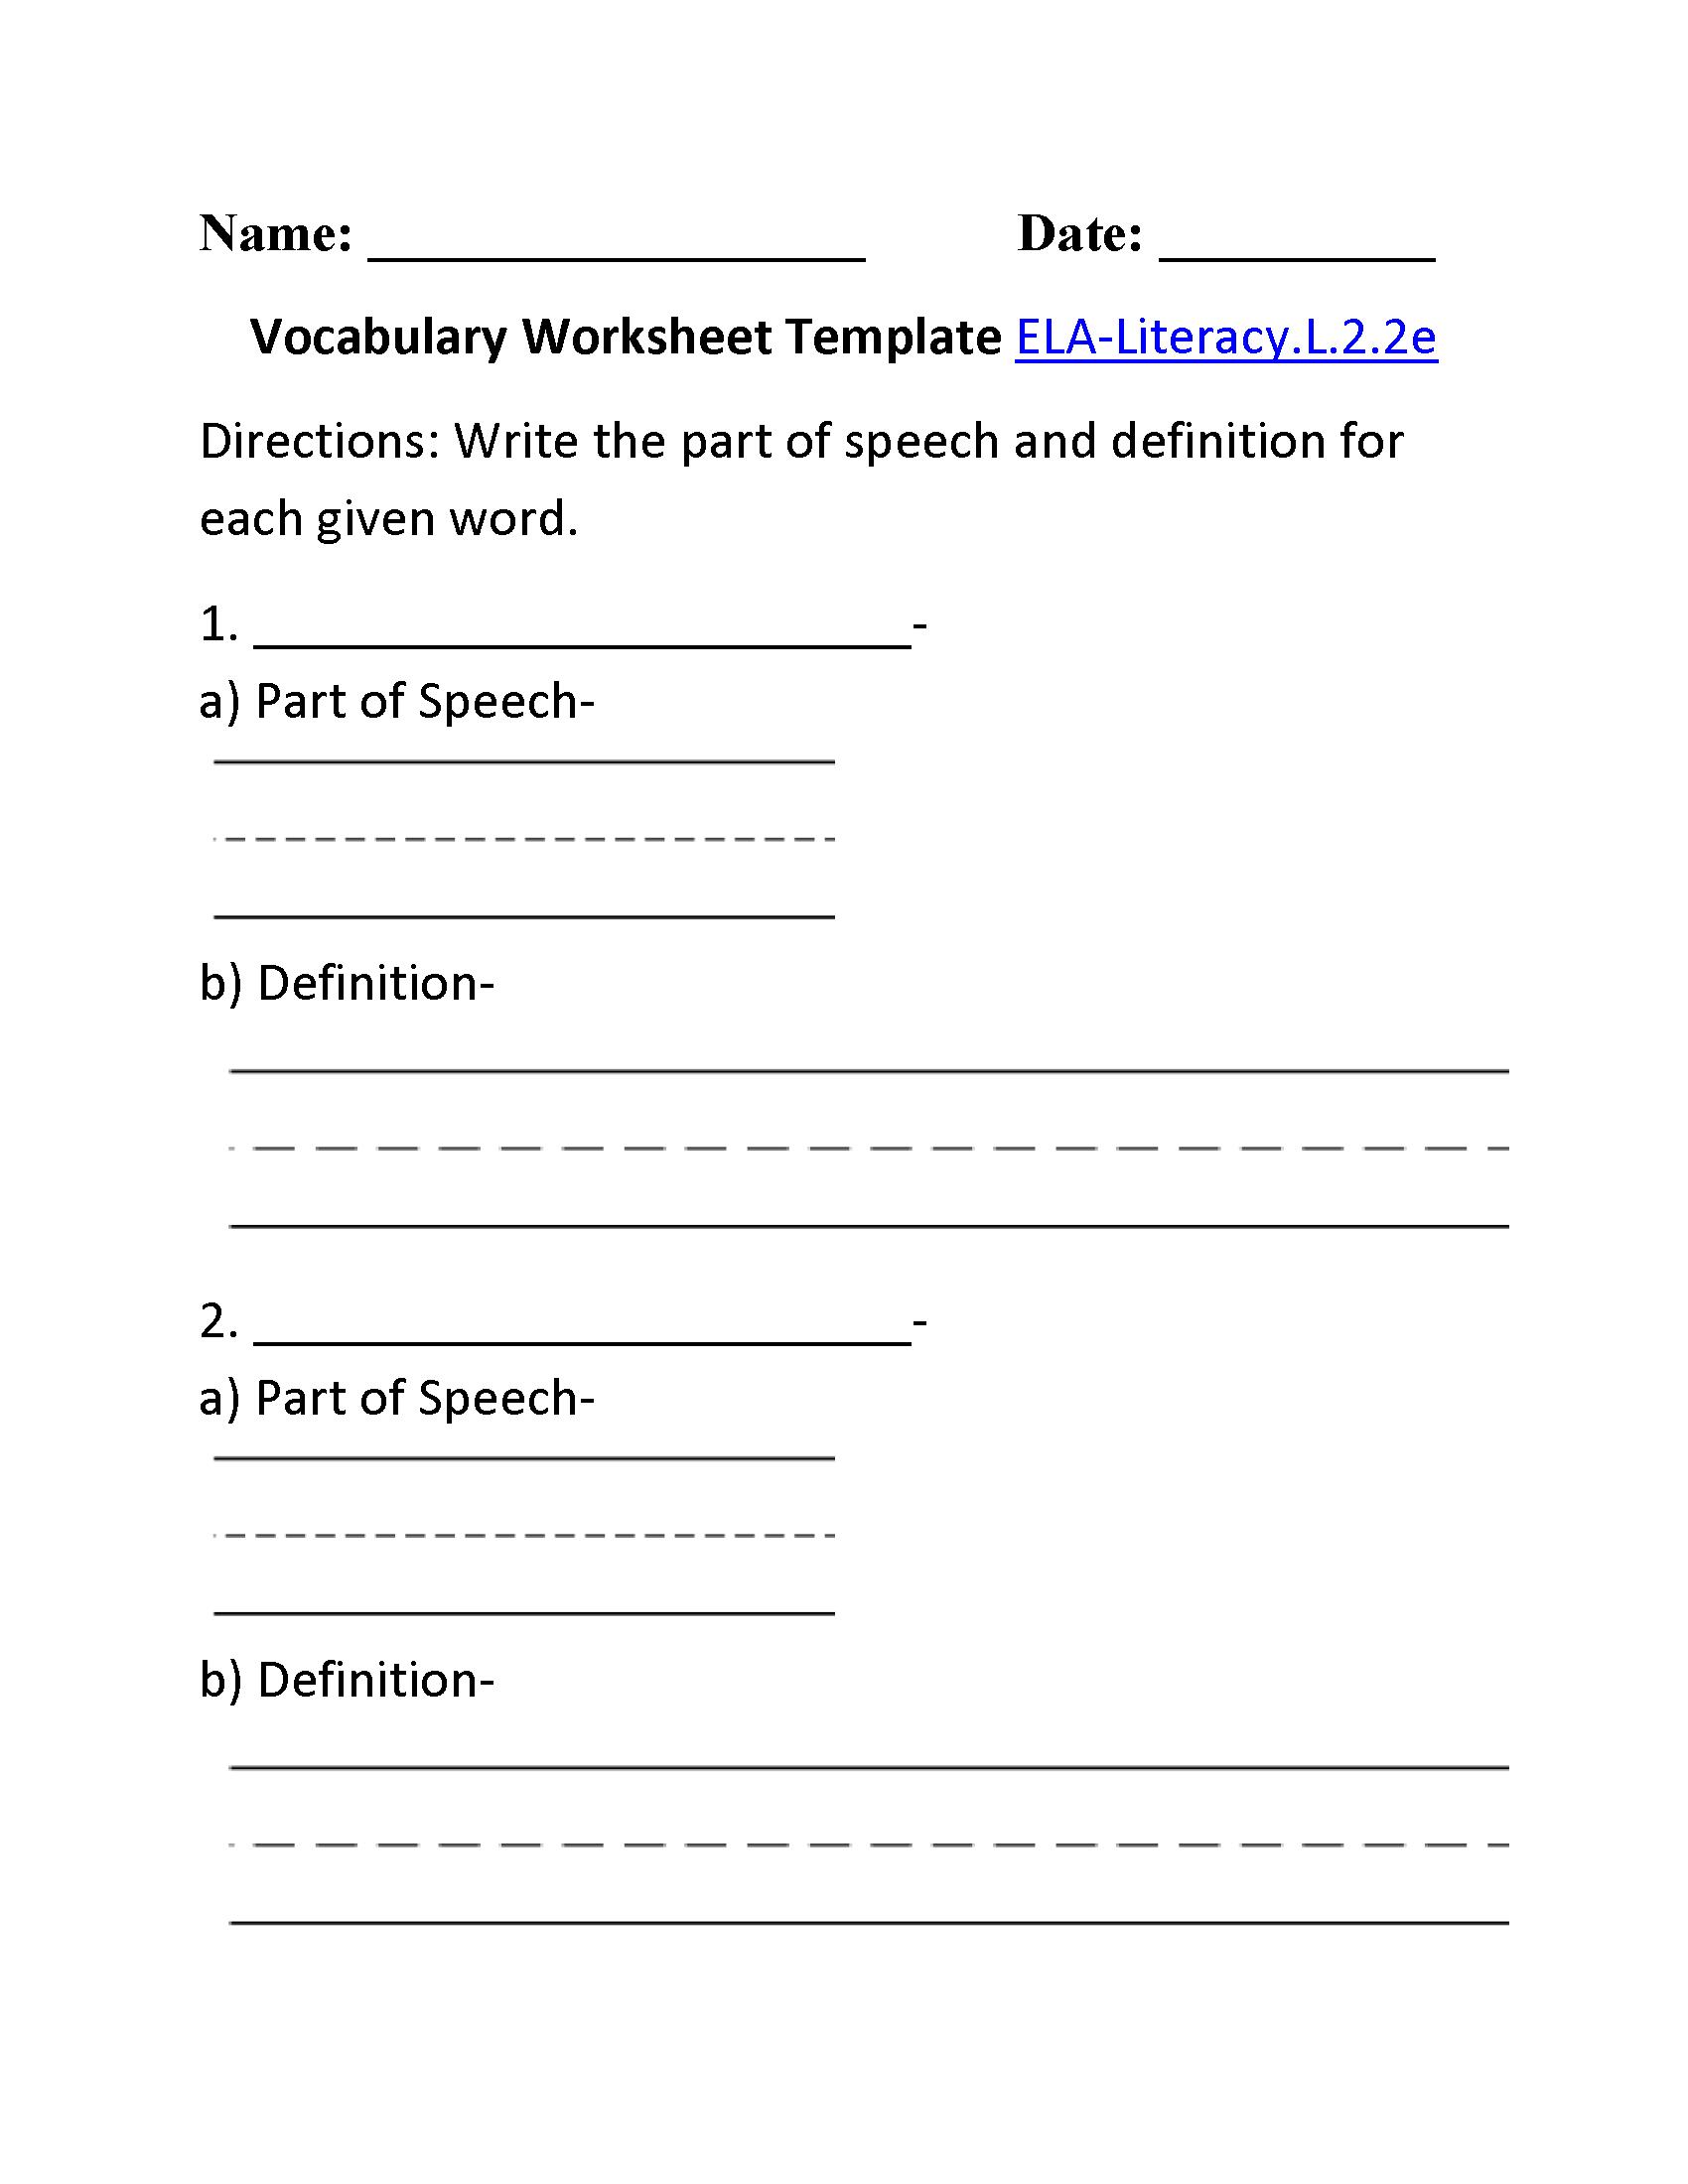 Worksheets Vocabulary Worksheet Template vocabulary template 2 ela literacy l 2e language worksheet worksheet